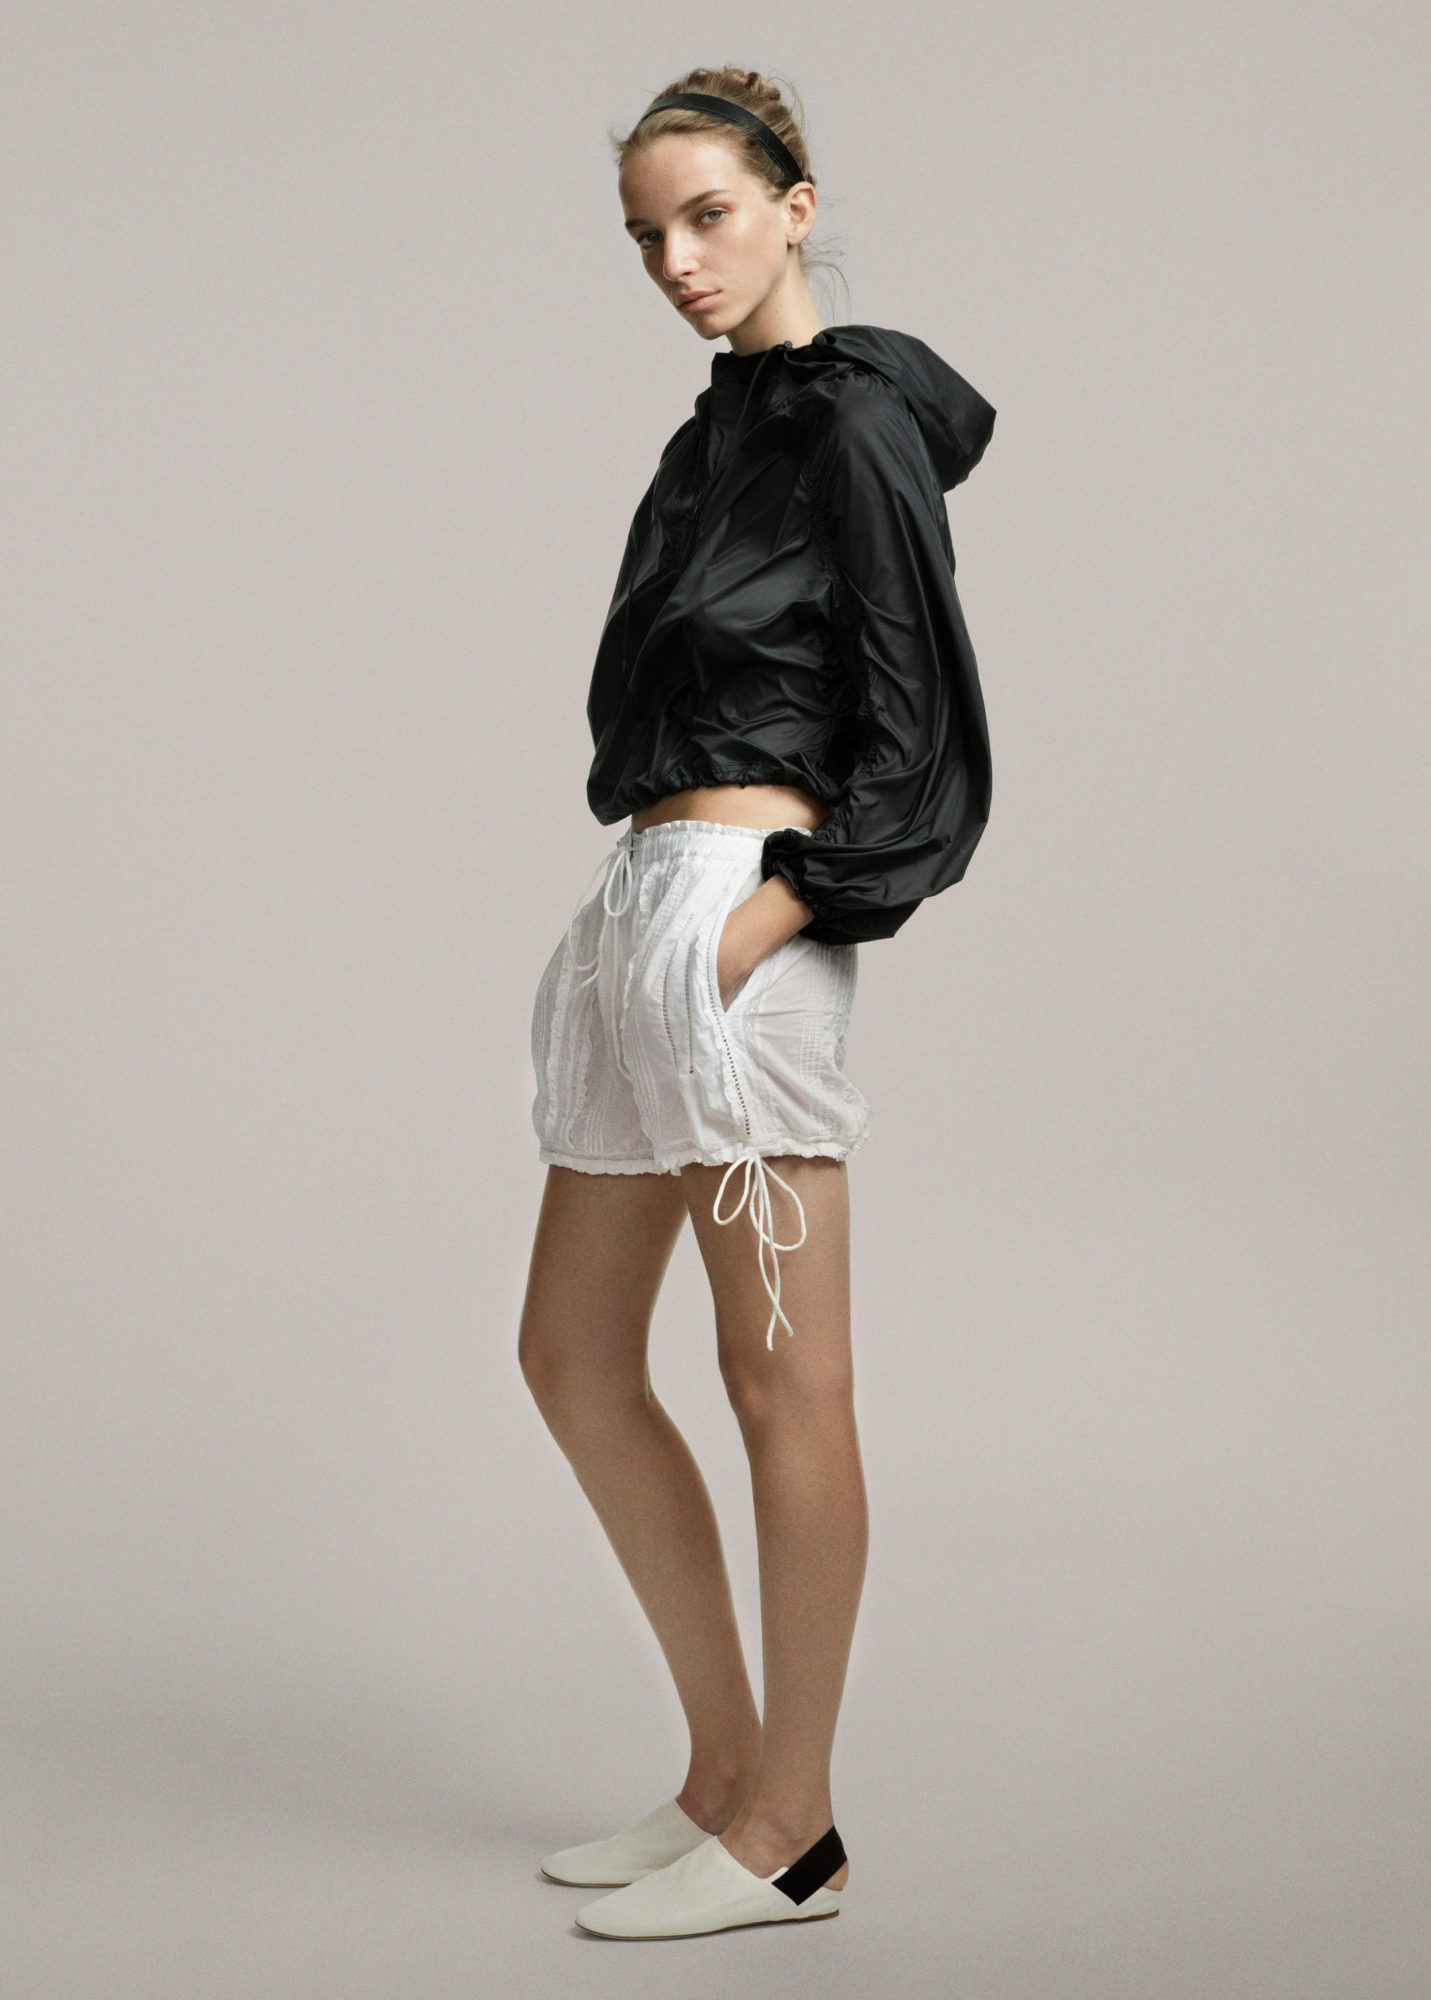 HM-Studio-women-Teaser-Lookbook-1.jpg